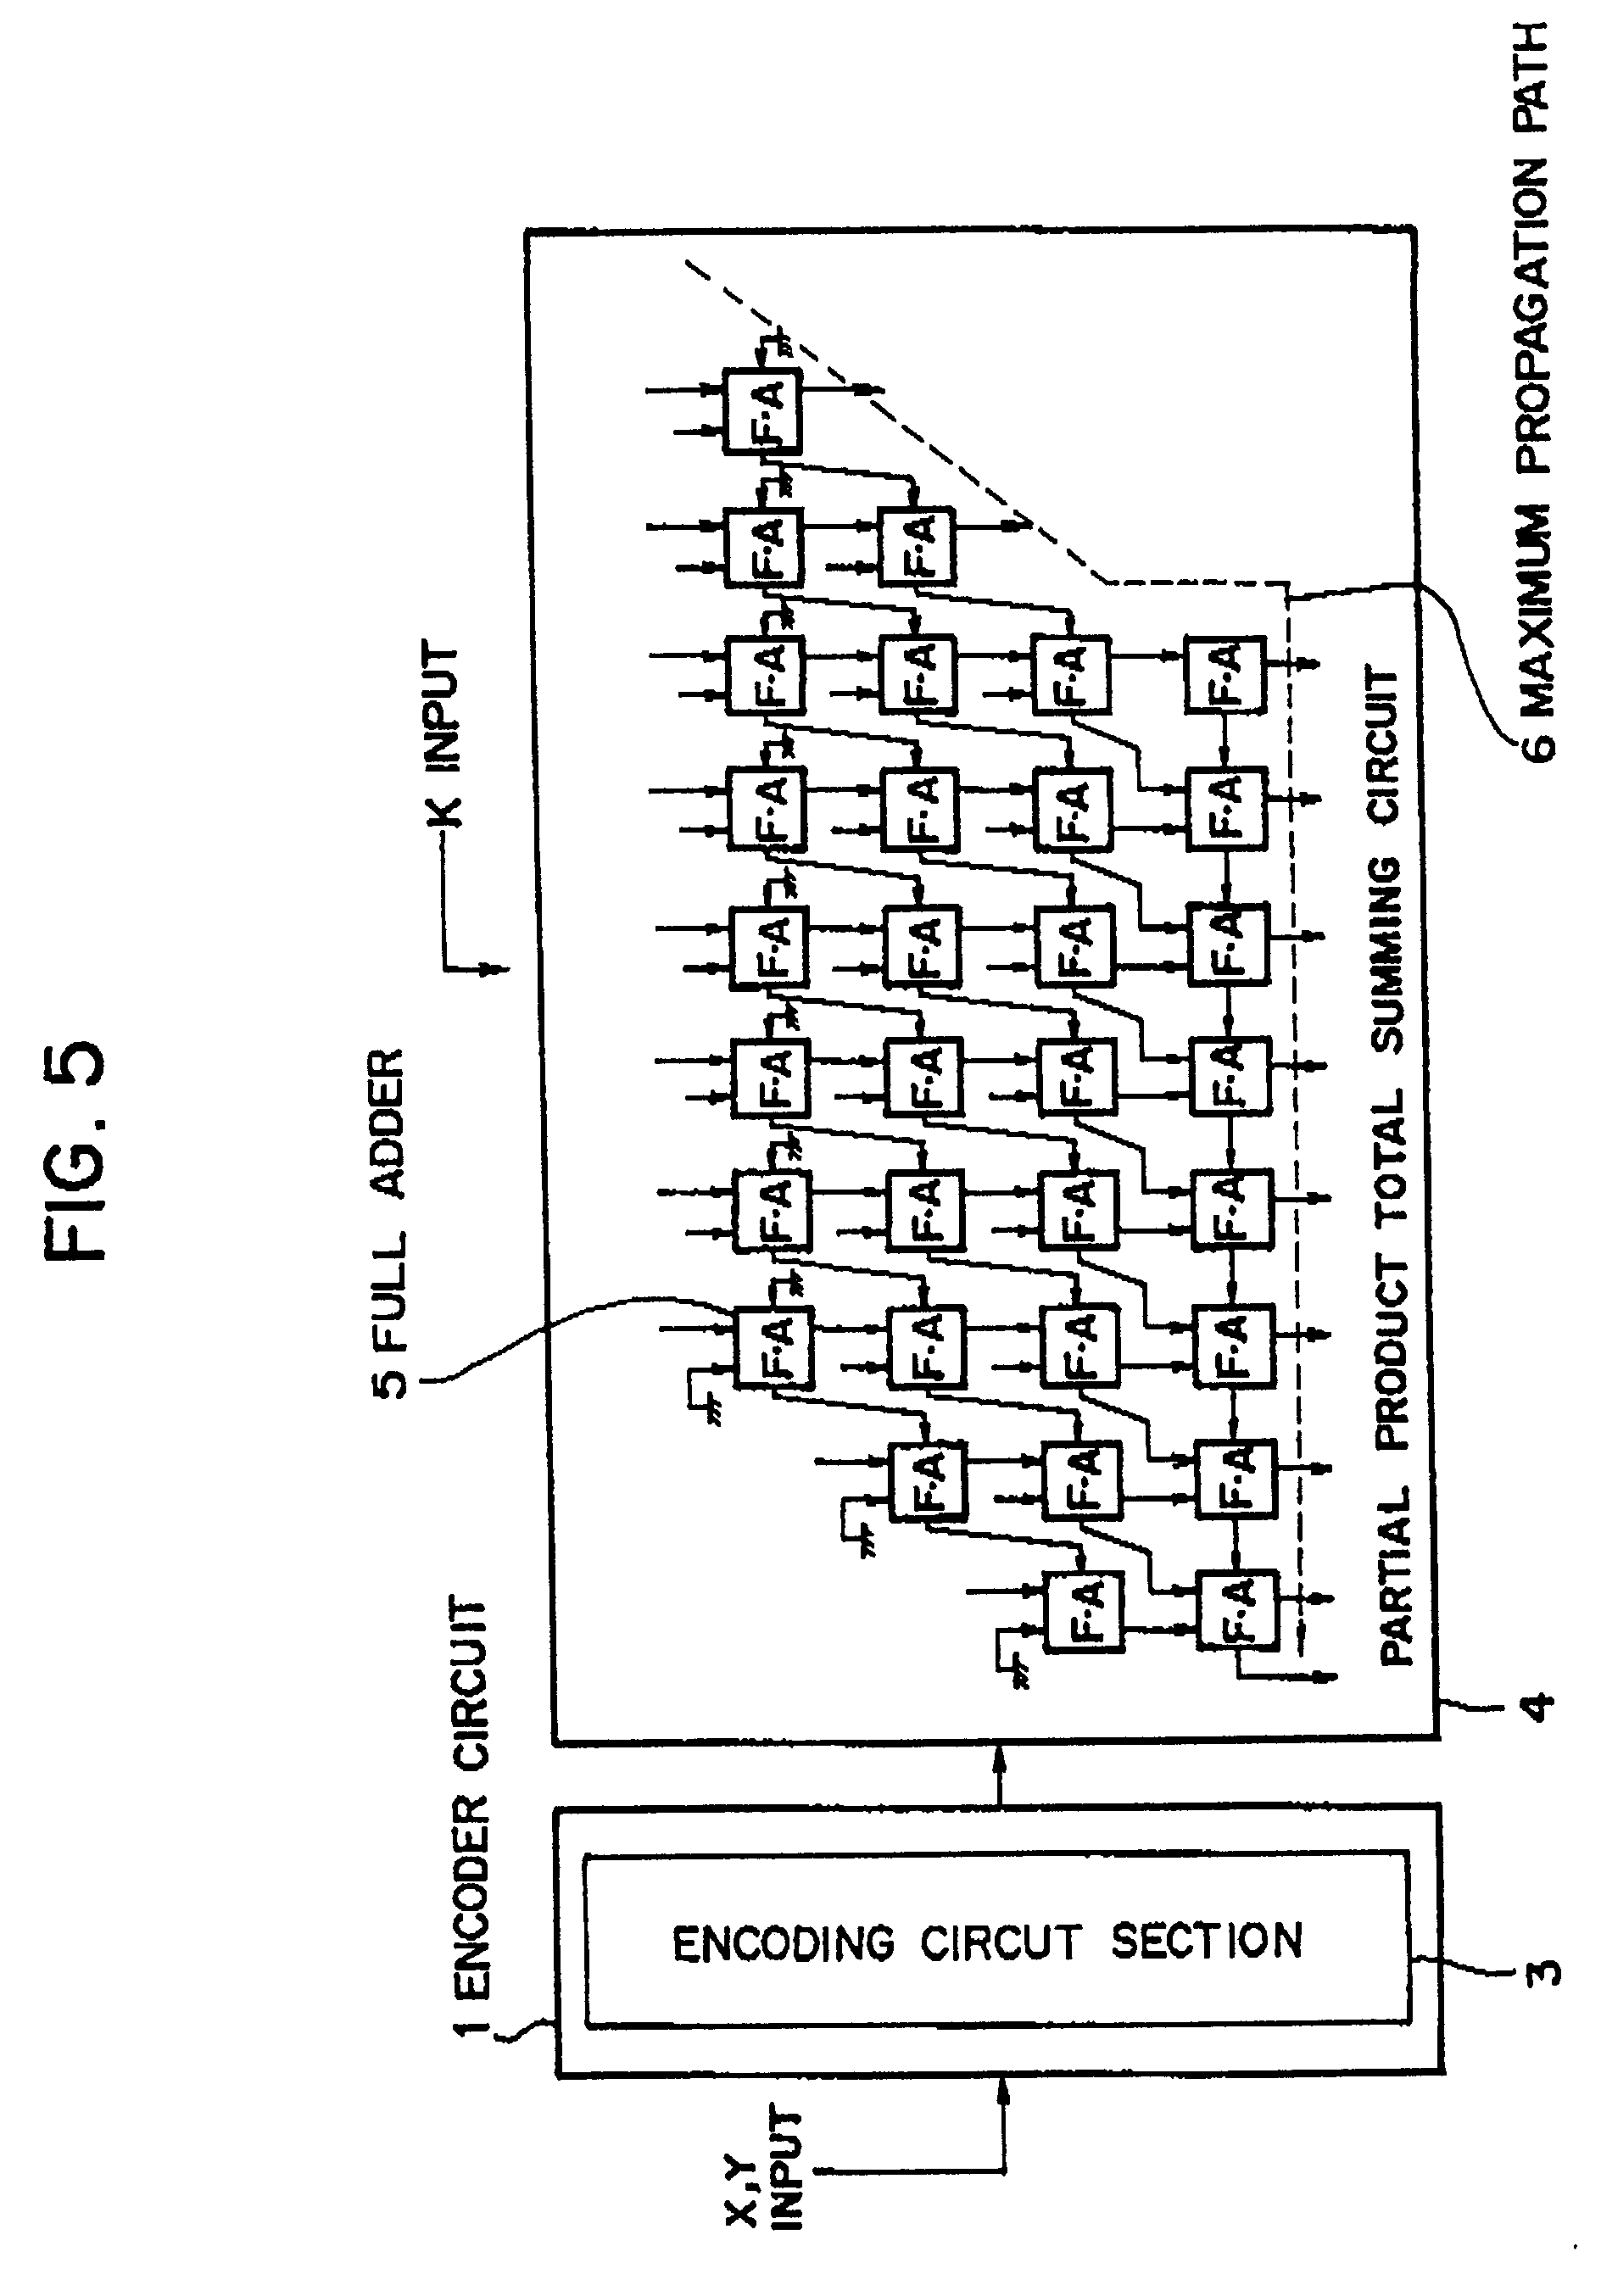 Adding Multiplier Patent 0561411 Circuit Diagram Of Full Adder Drawing